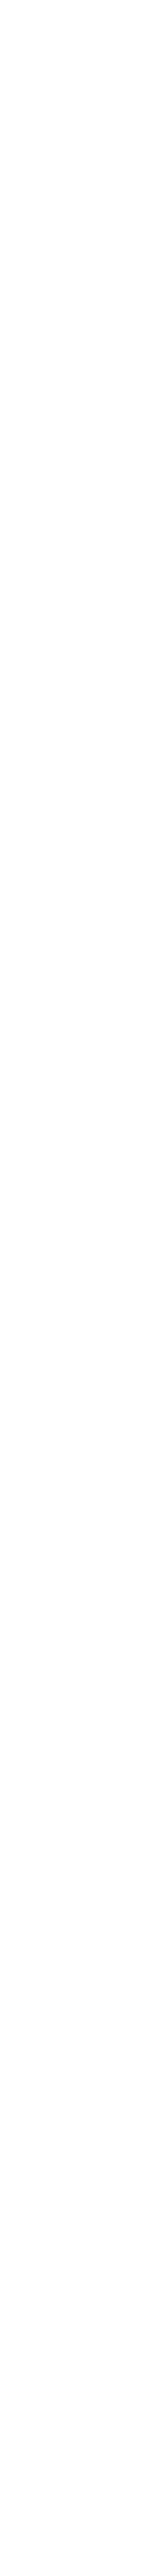 logo slogan feria Leon brandcenter design identity Logotype